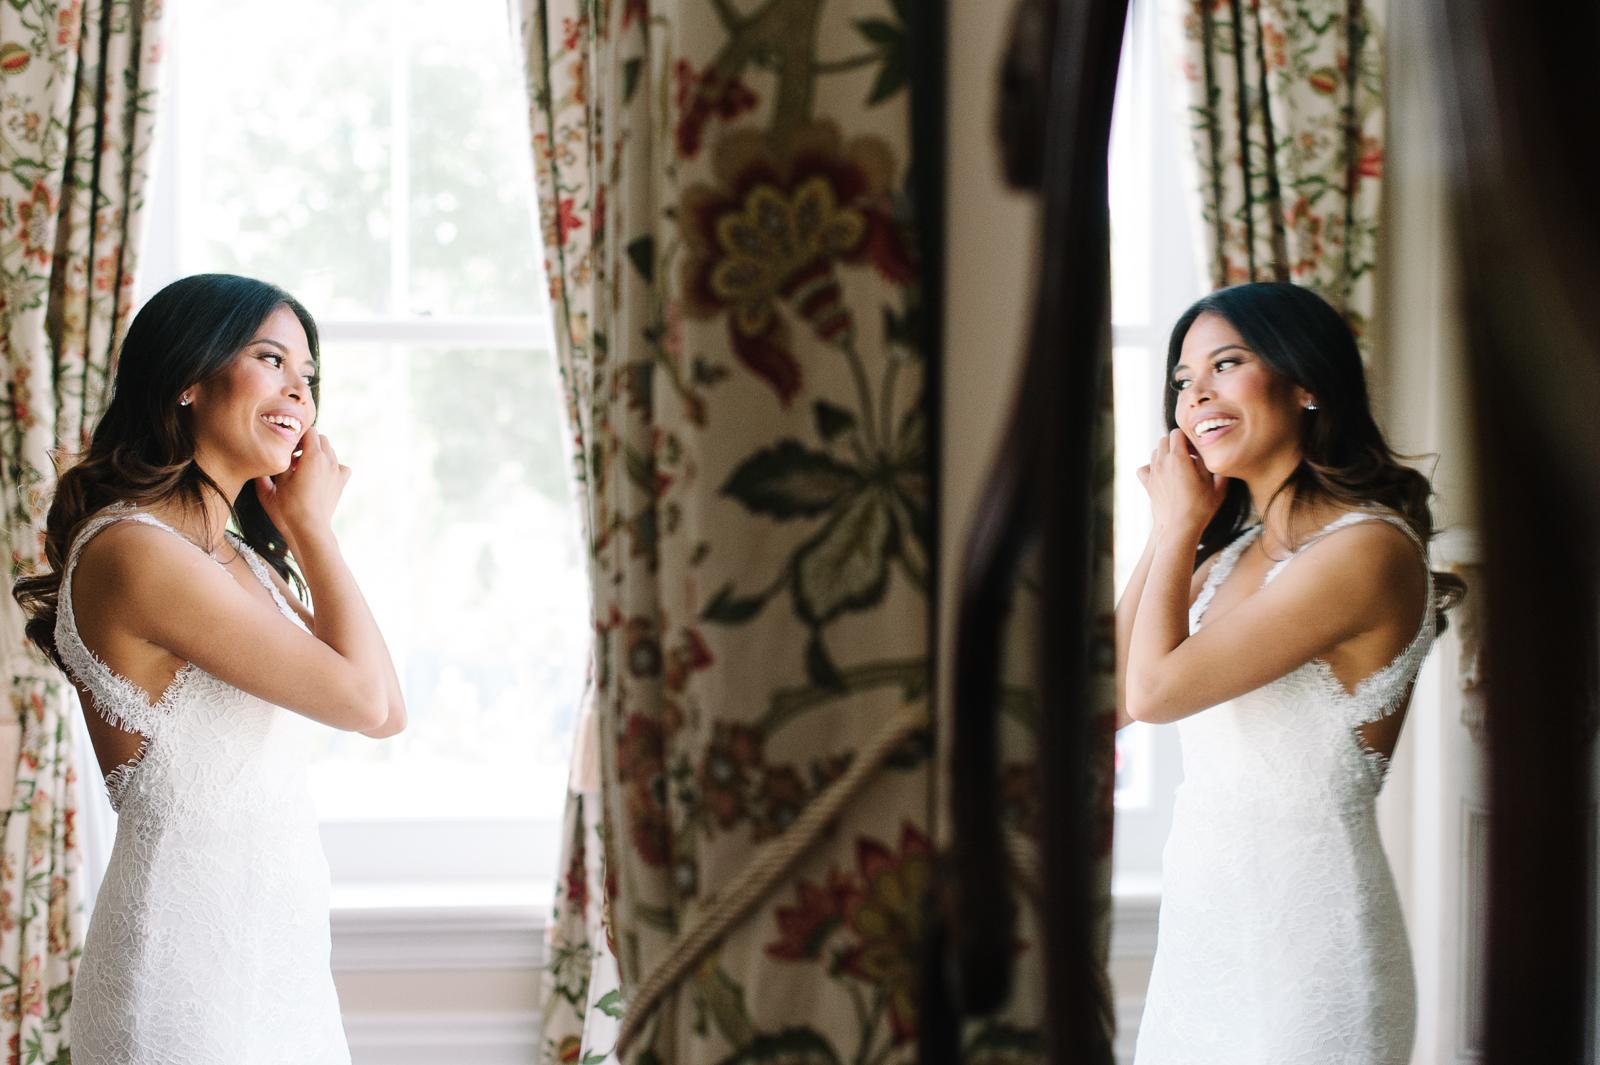 tara-mcmullen-photography-toronto-wedding-photography-alderlea-mansion-wedding-alderlea-wedding-brampton-scotsdale-farm-wedding-reem-acra-wedding-003